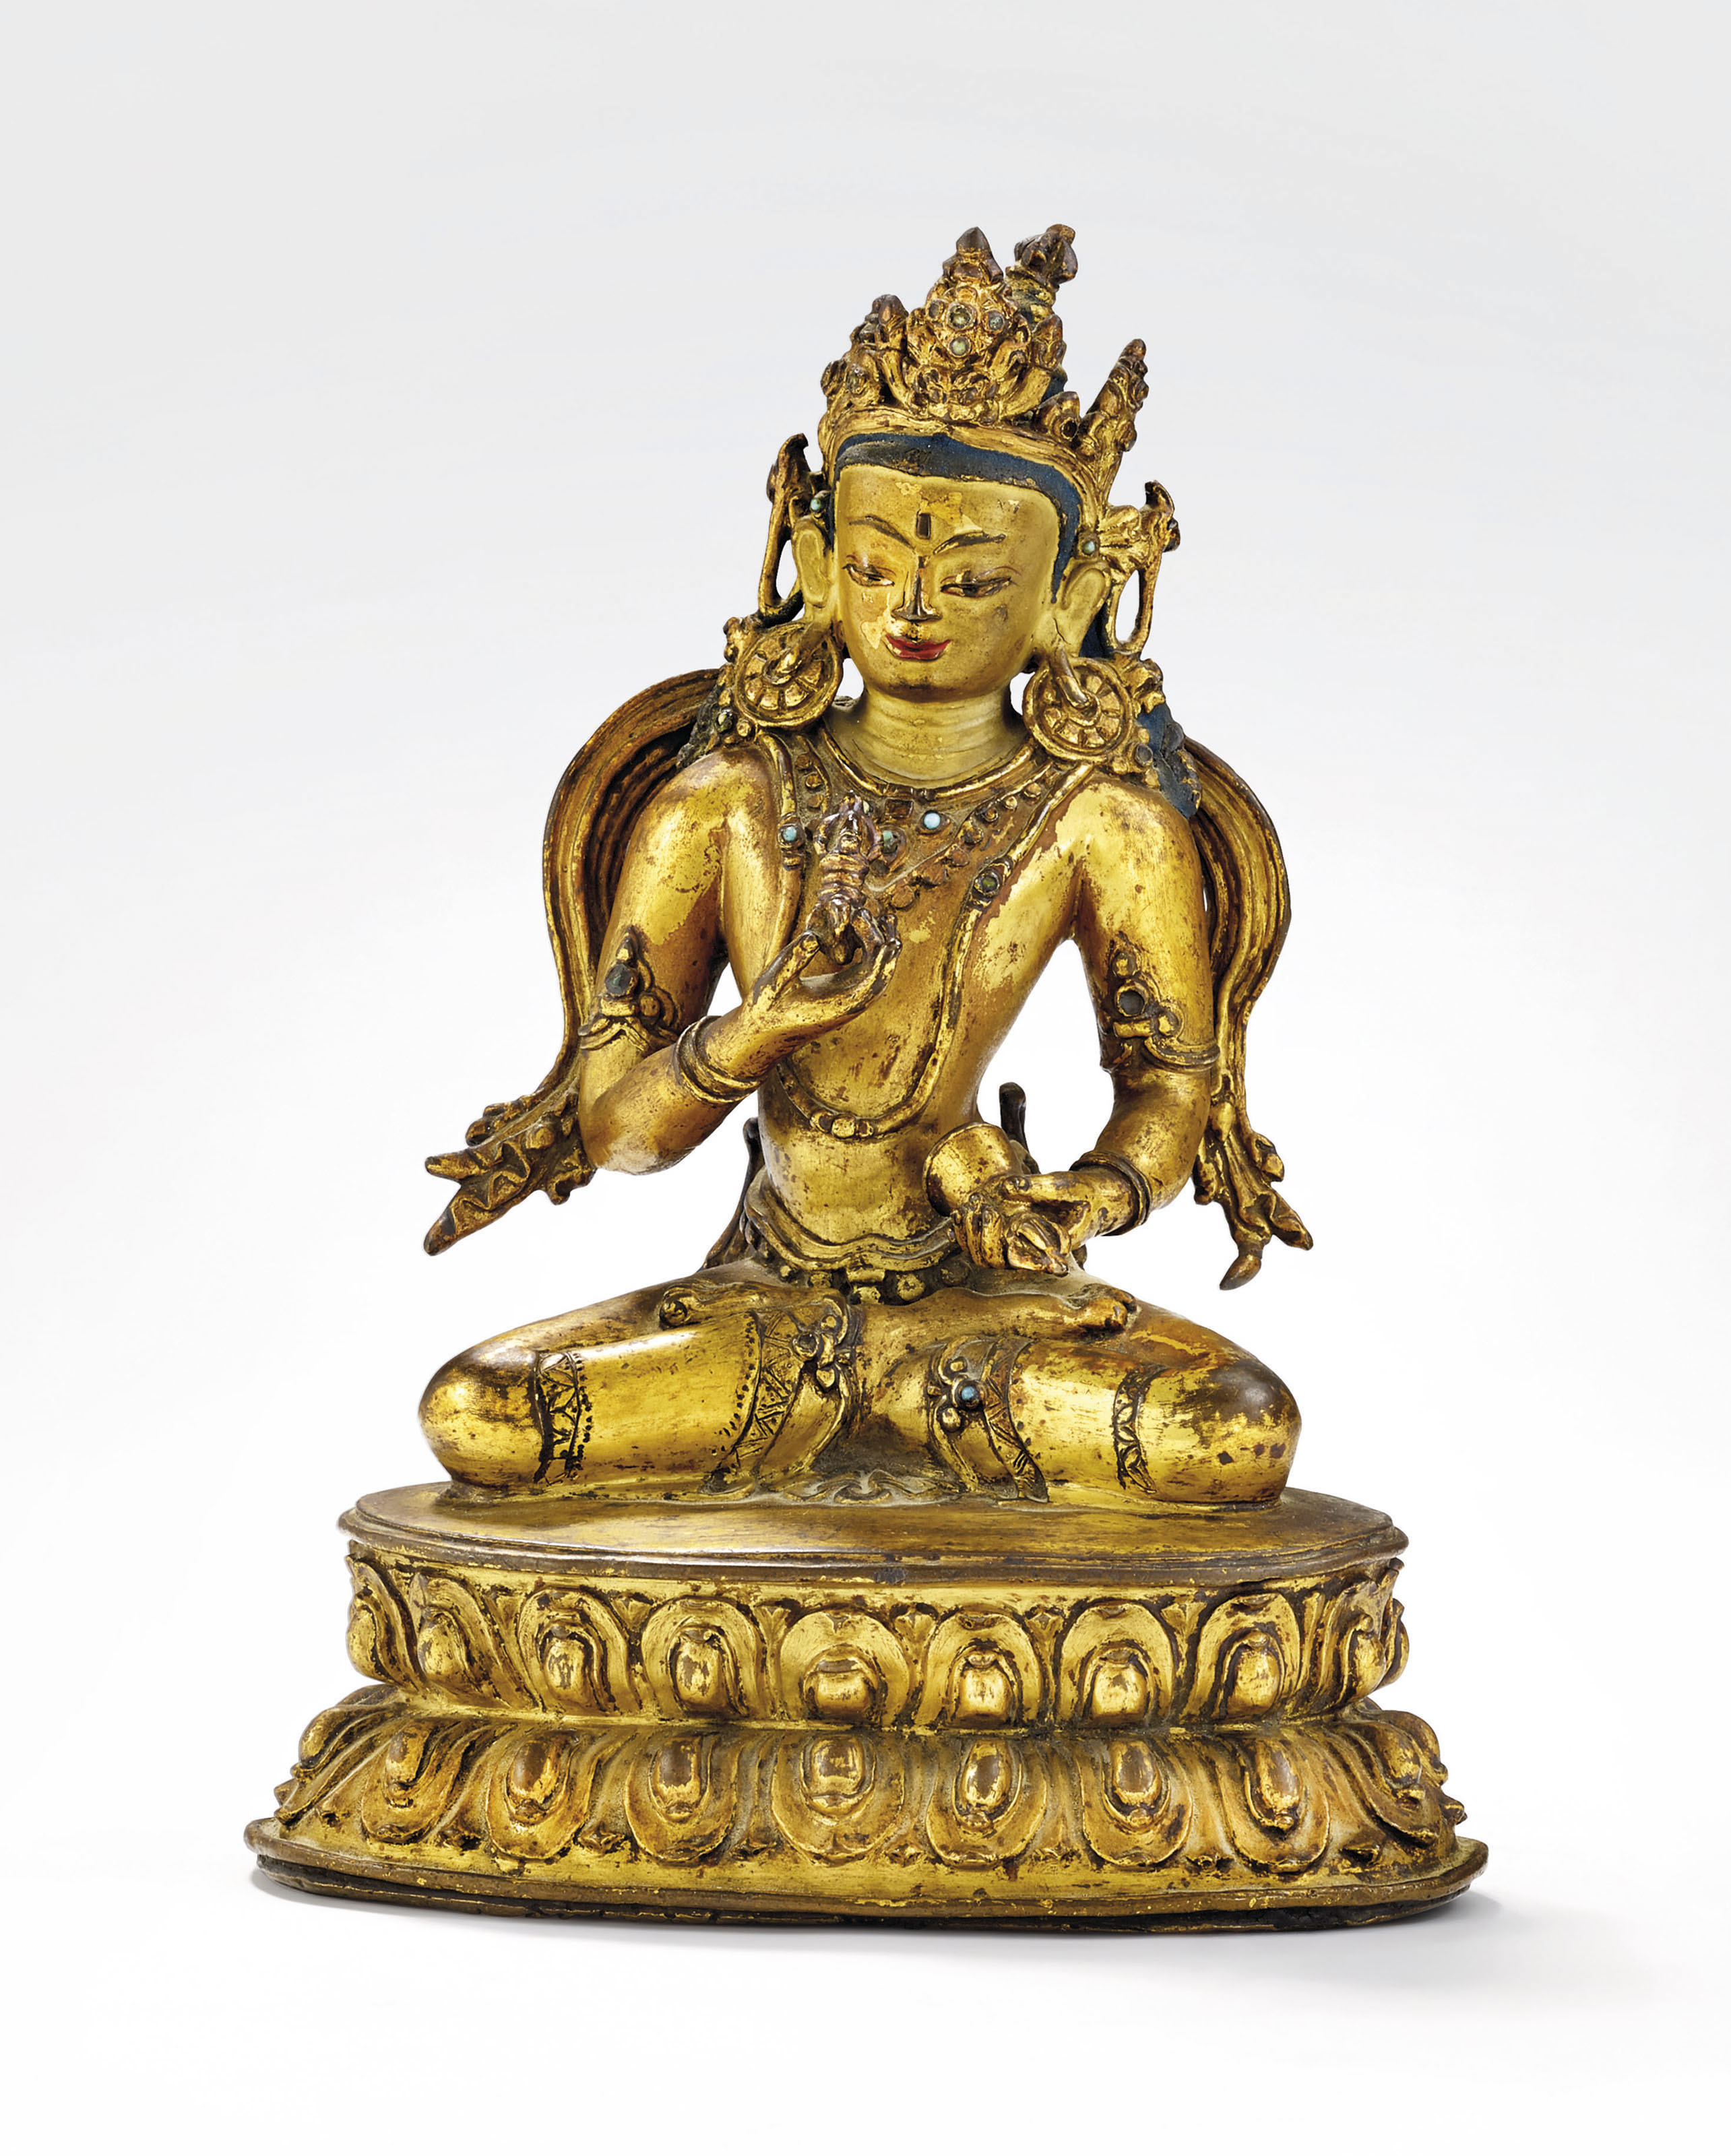 Картинки буддизма и его вещи